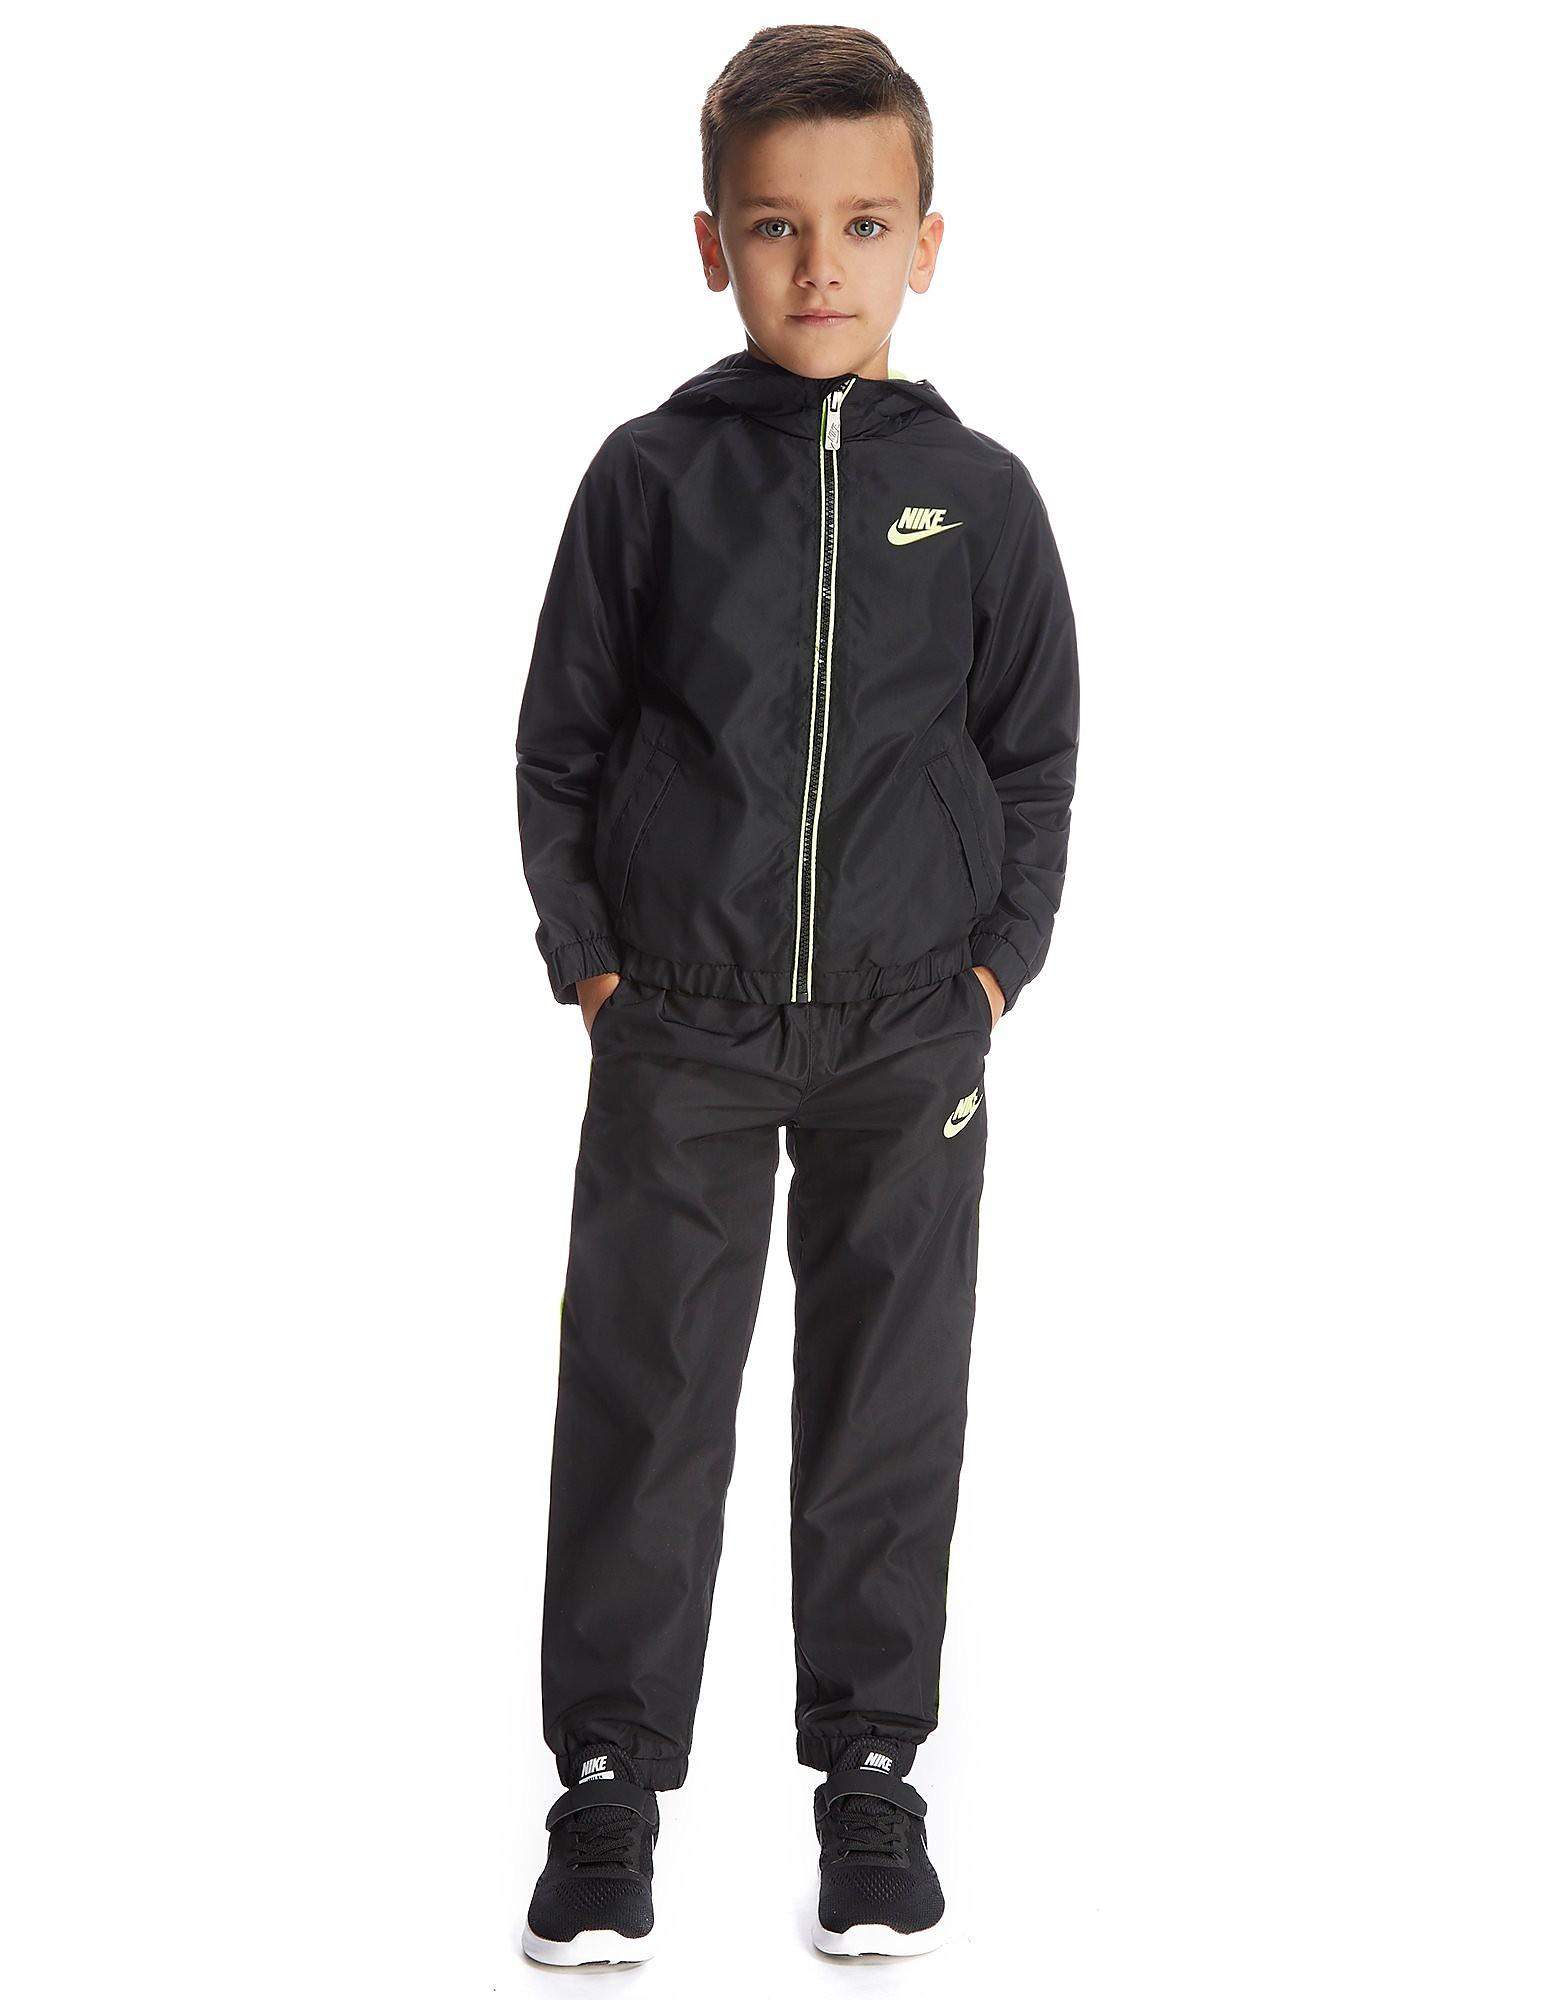 Nike Woven Suit Children